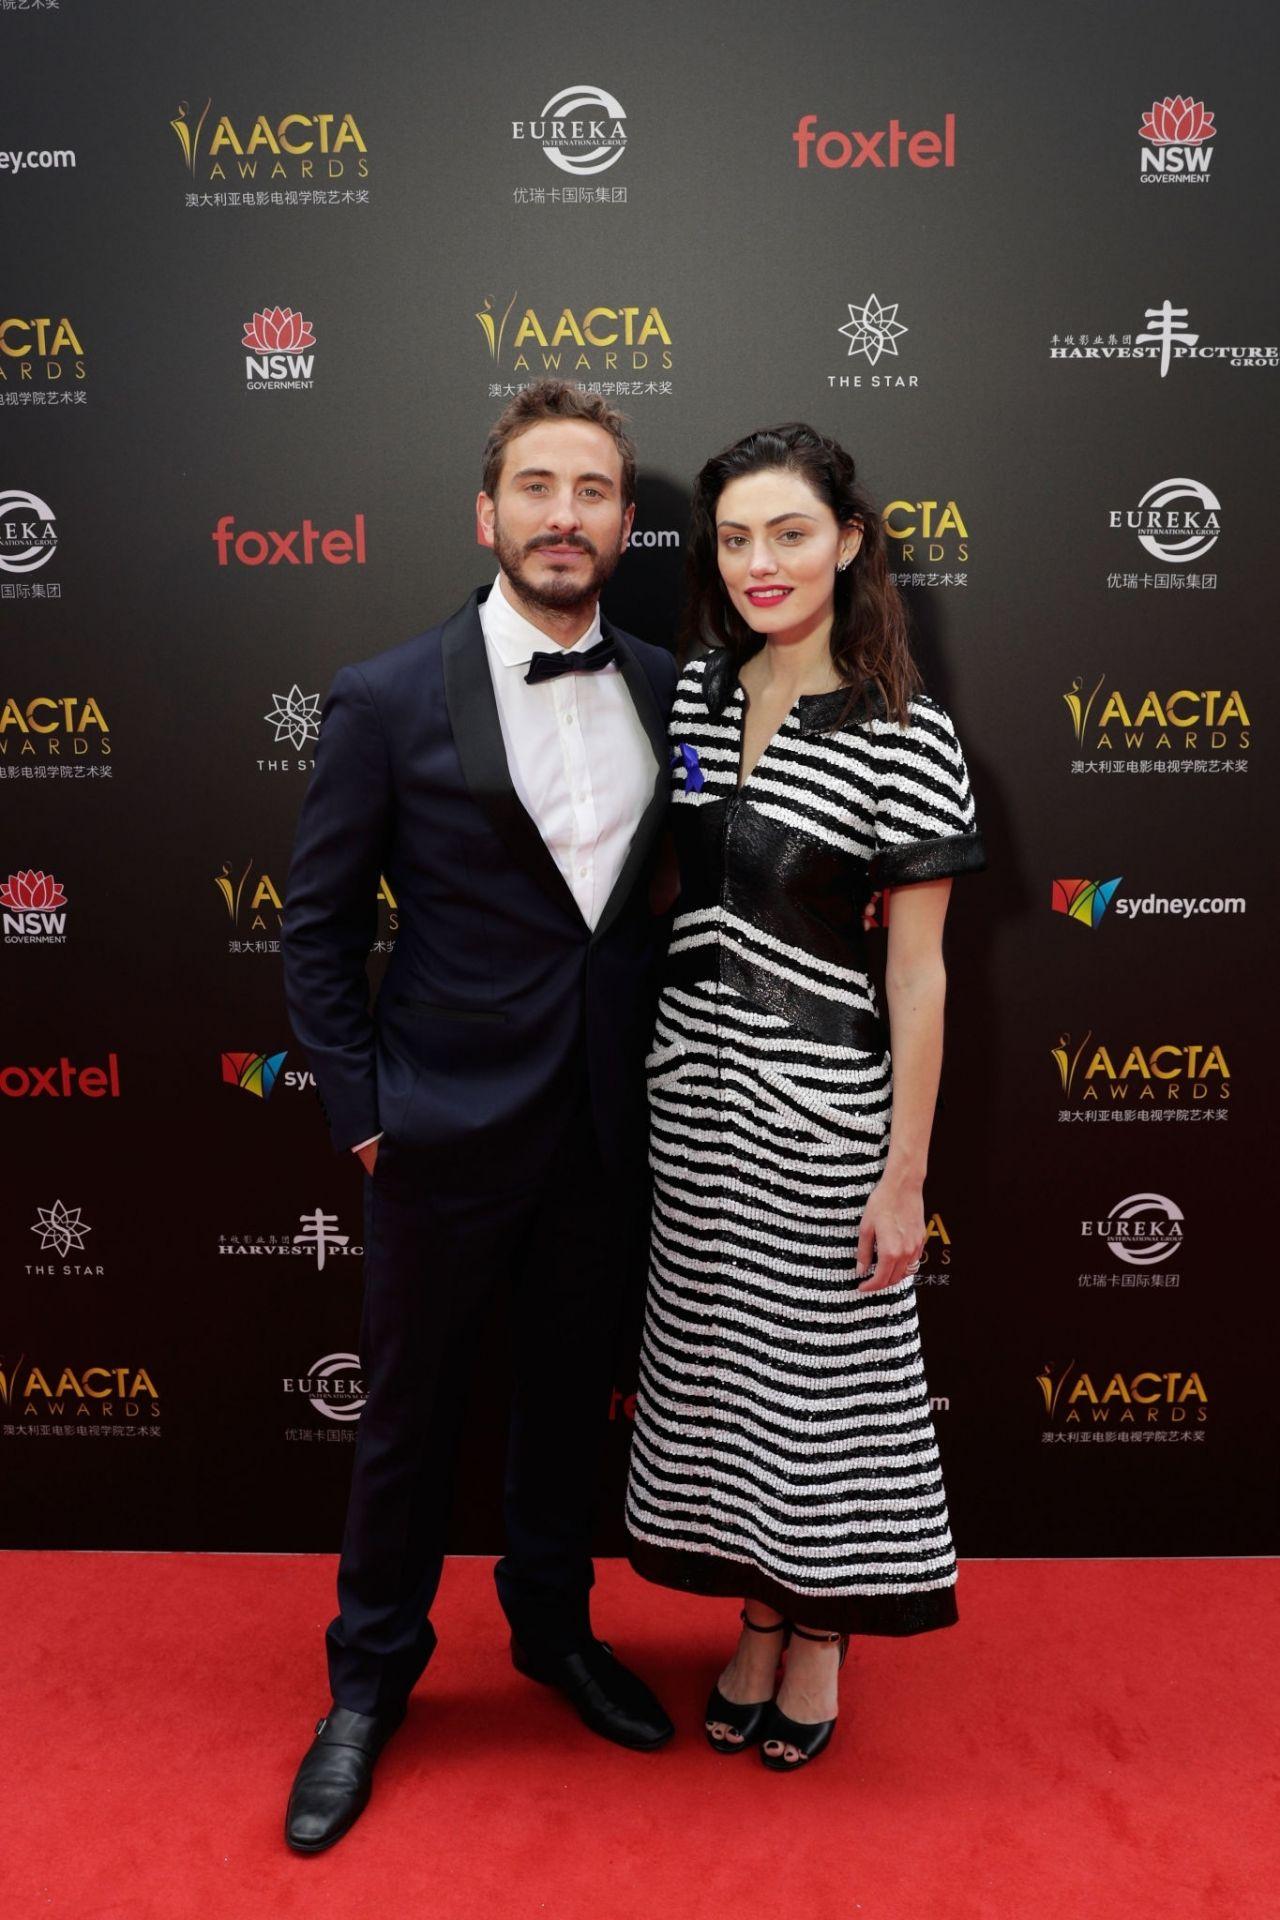 aacta awards - photo #27